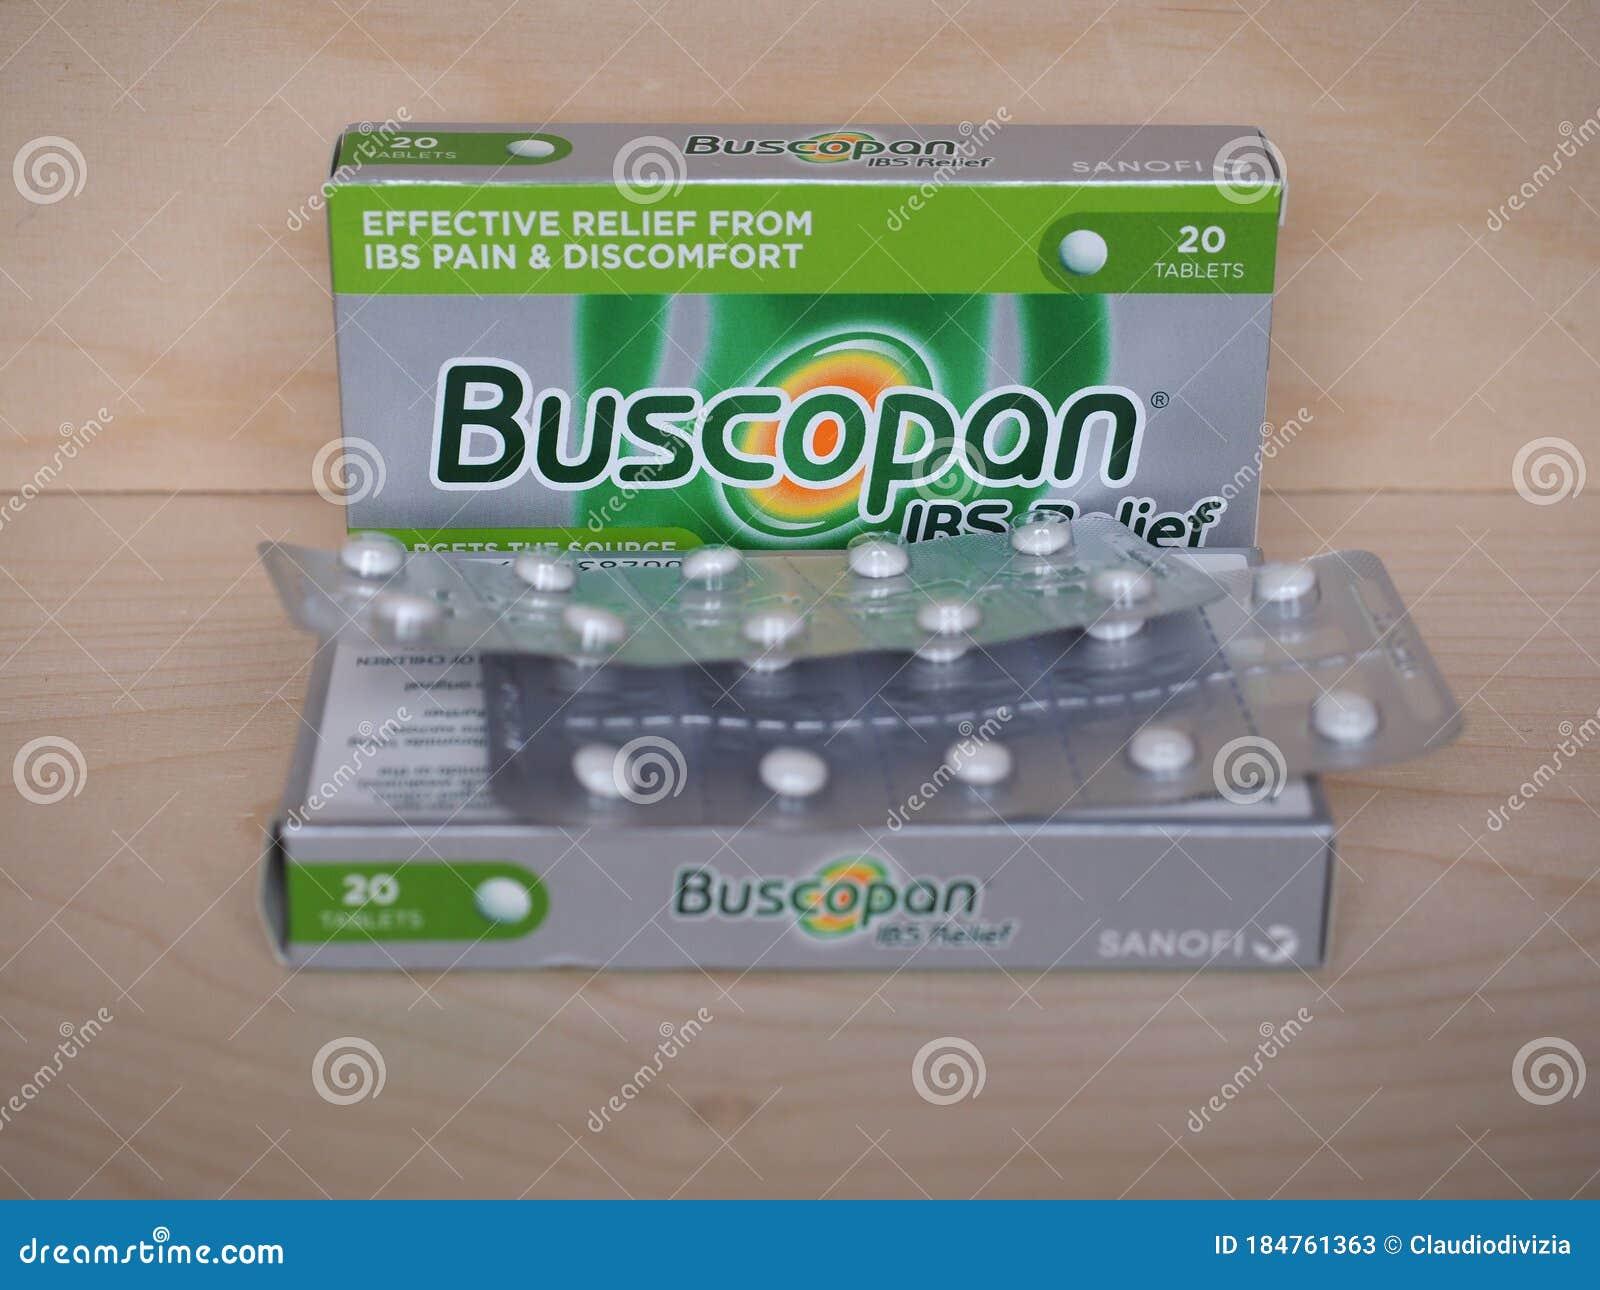 Ibuprofen buscopan Ibuprofen